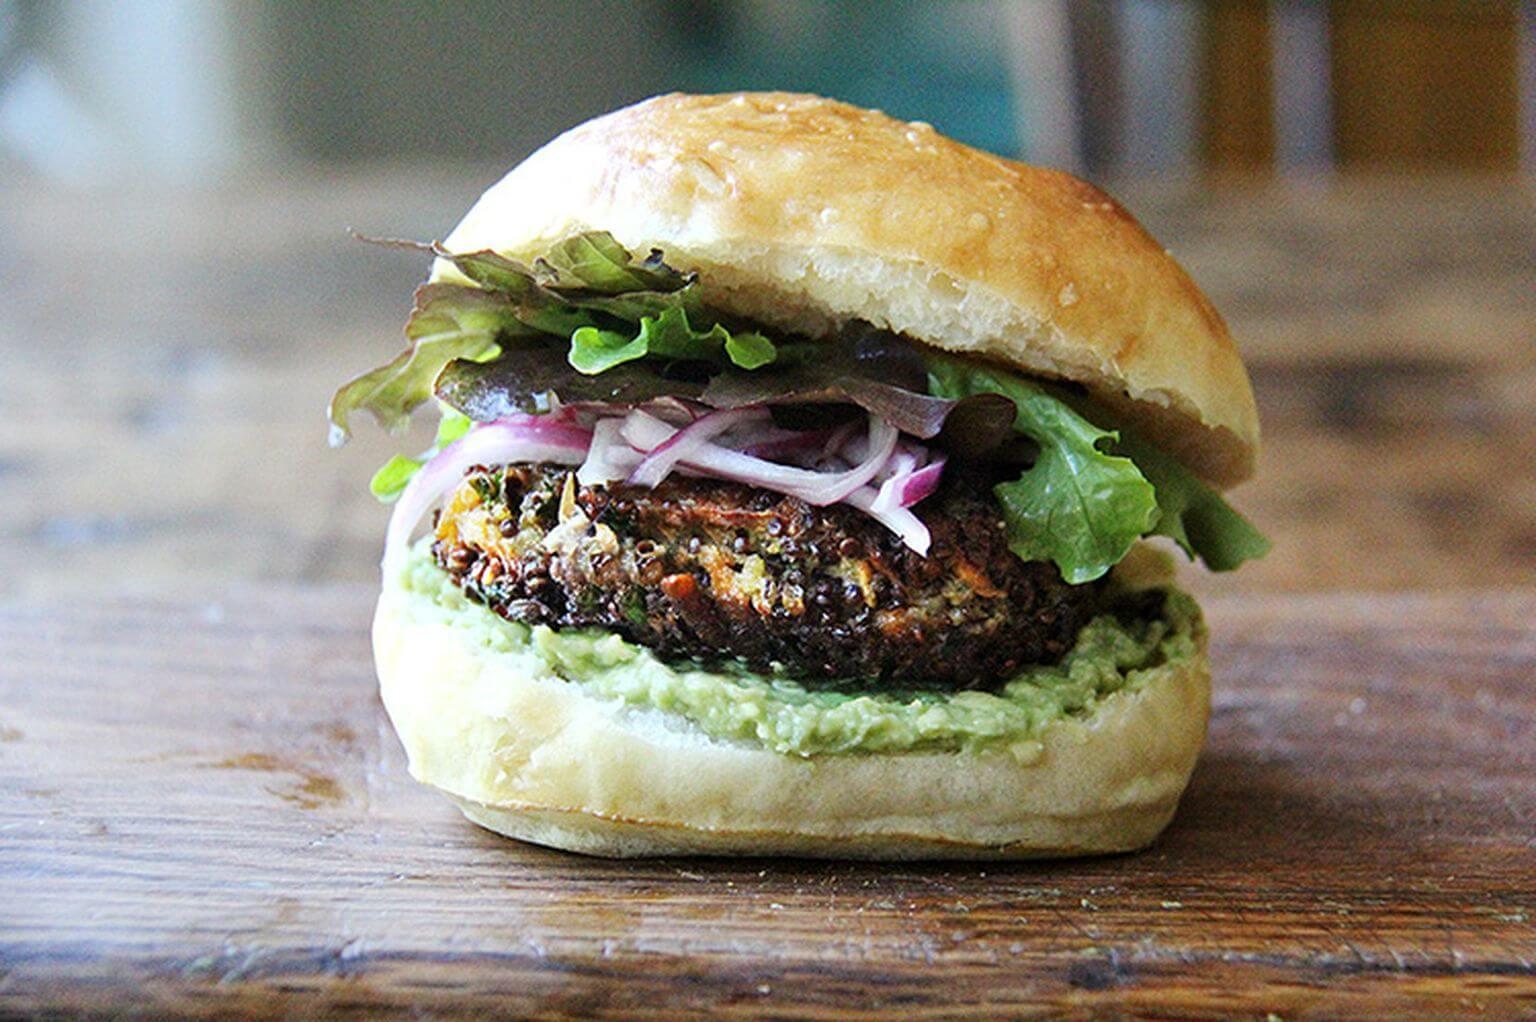 A mushroom-quinoa veggie burger on a board.